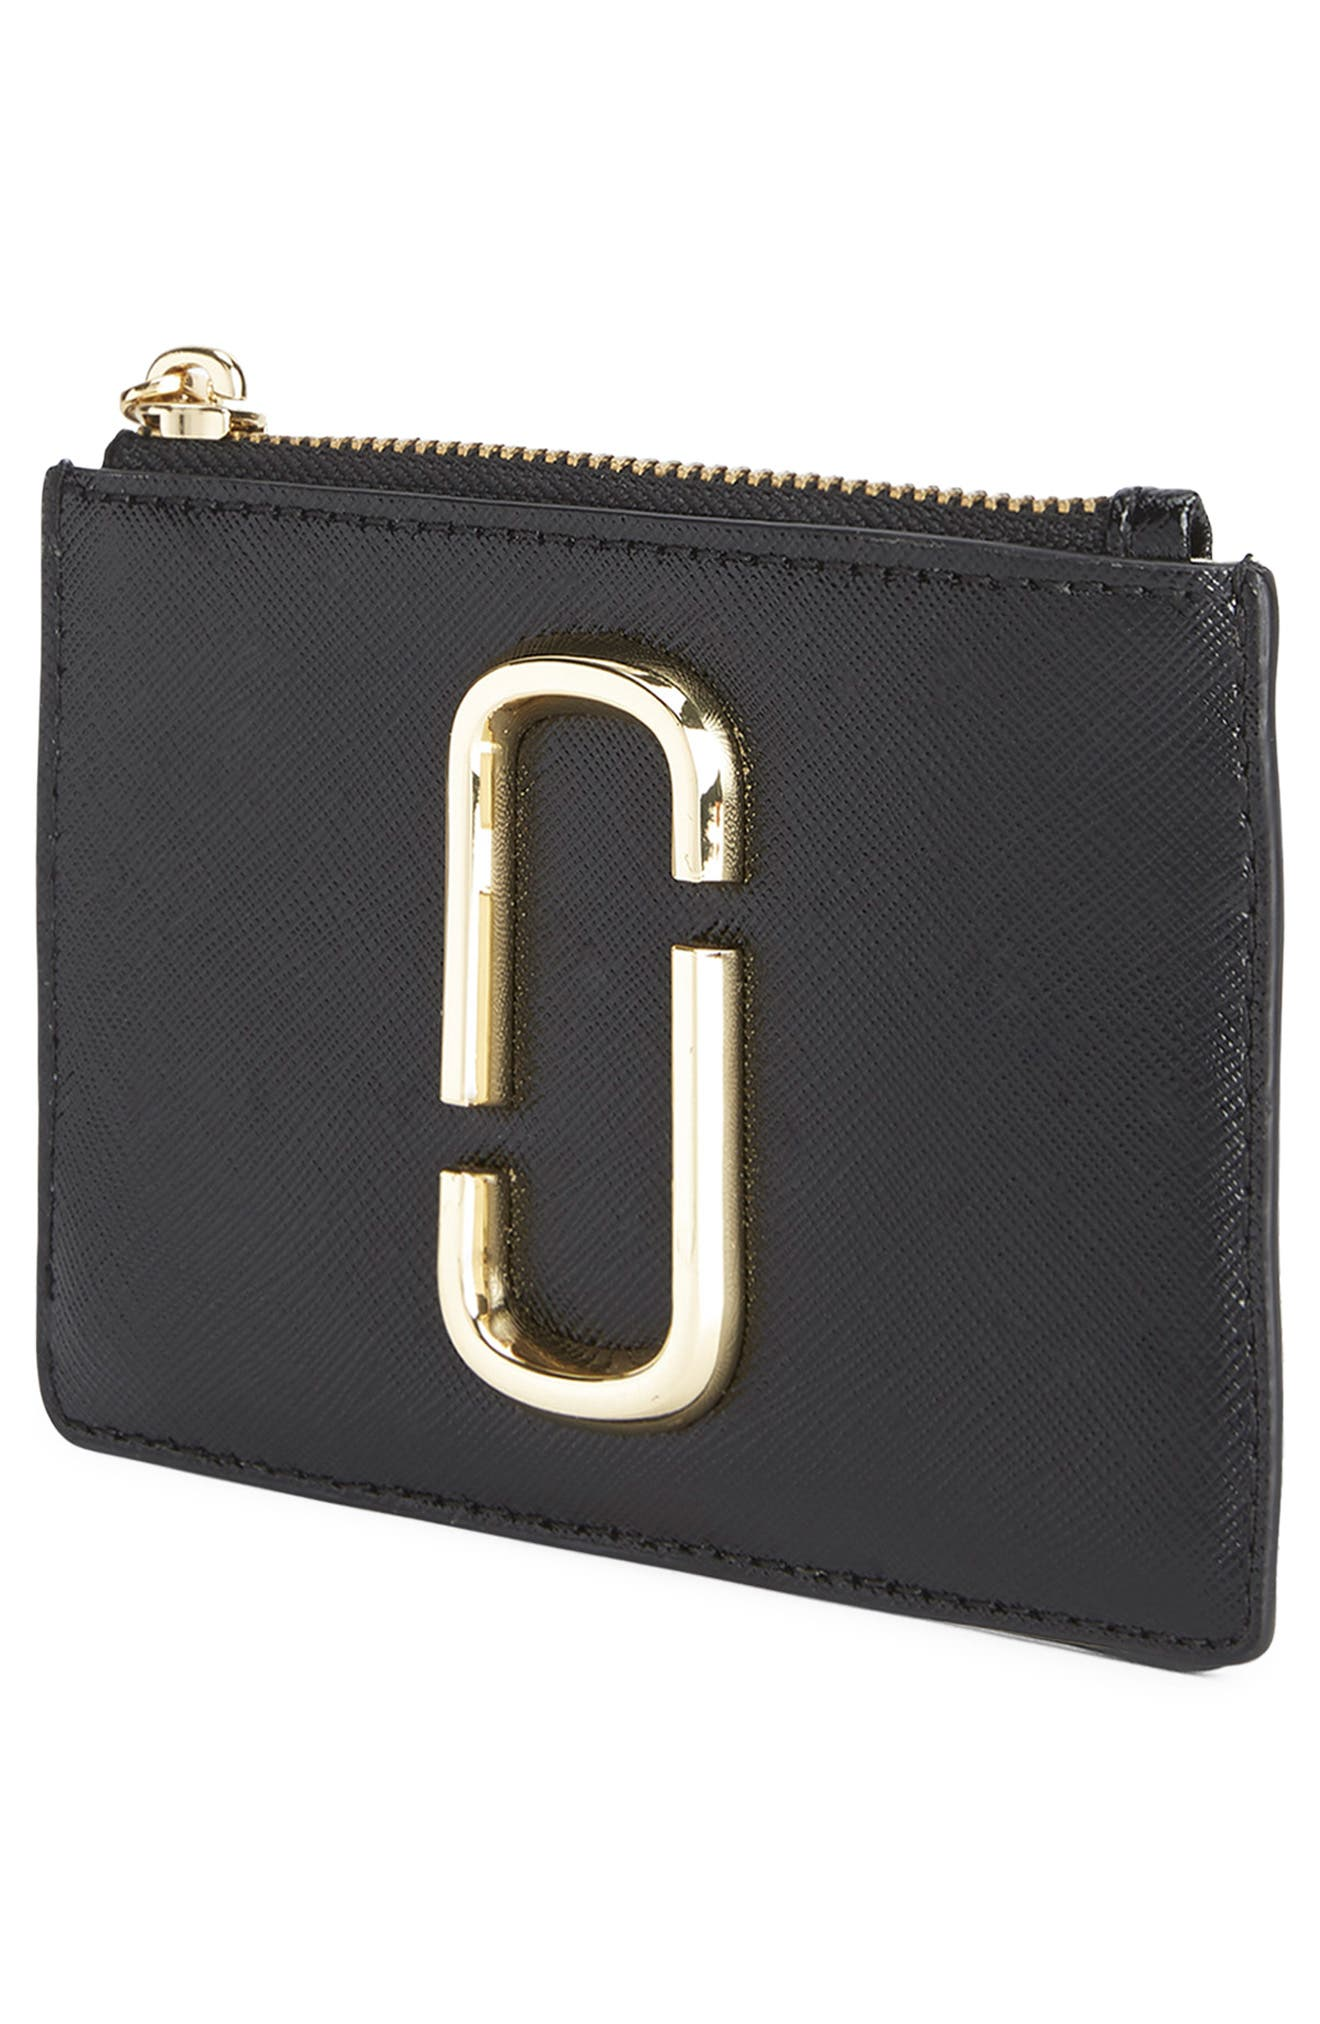 Snapshot Small Leather Wallet,                             Alternate thumbnail 5, color,                             BLACK MULTI